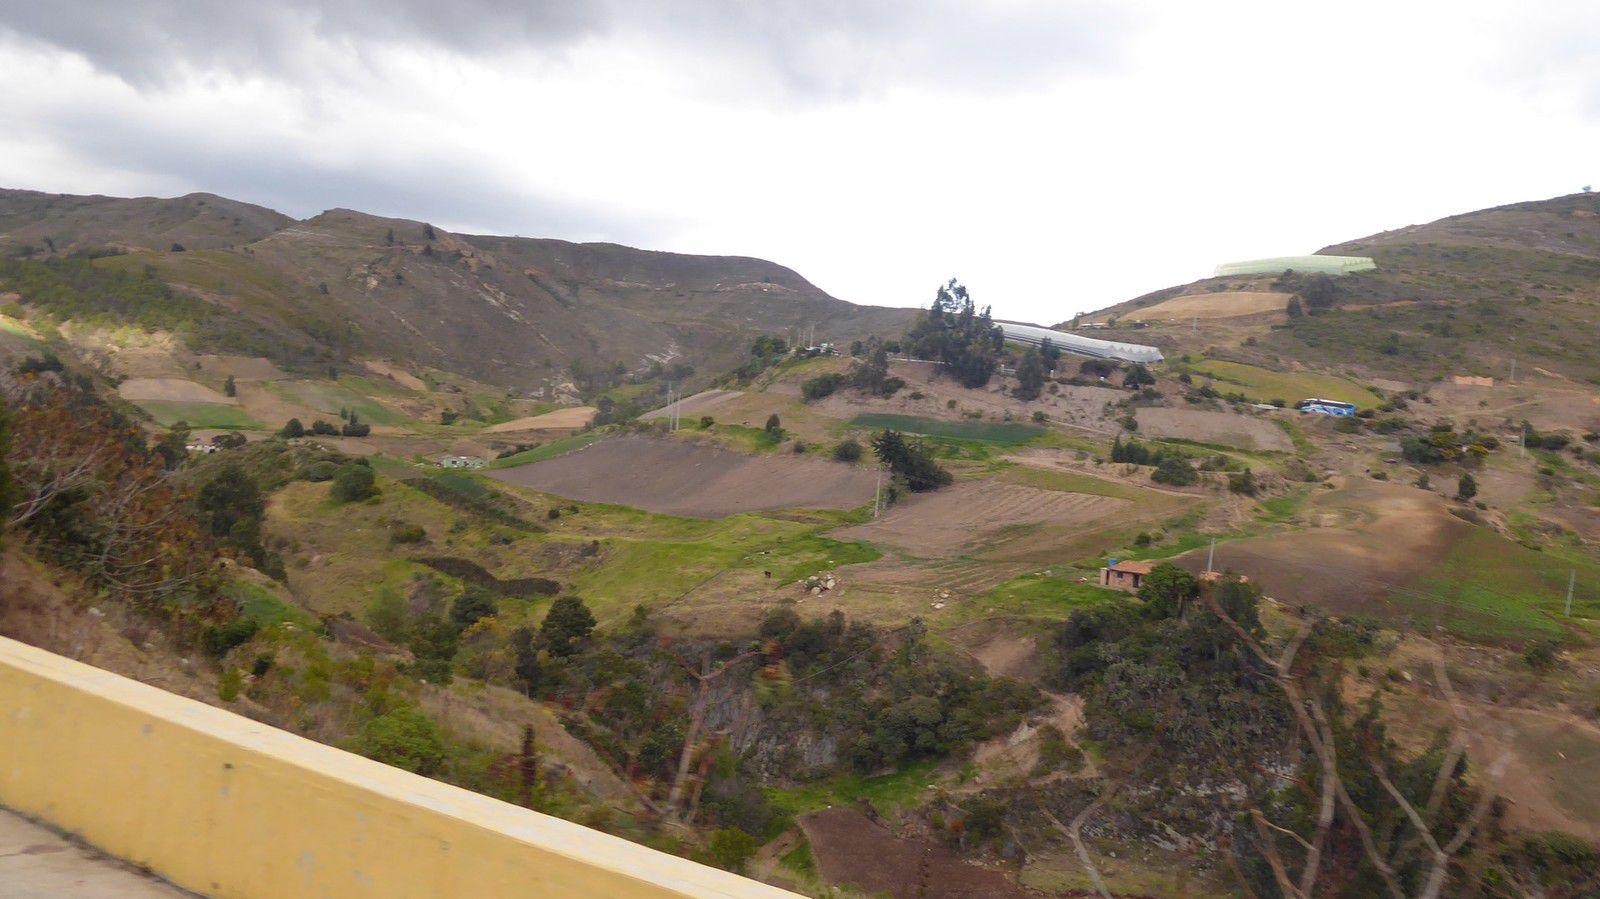 J39 - Villa de Leyva